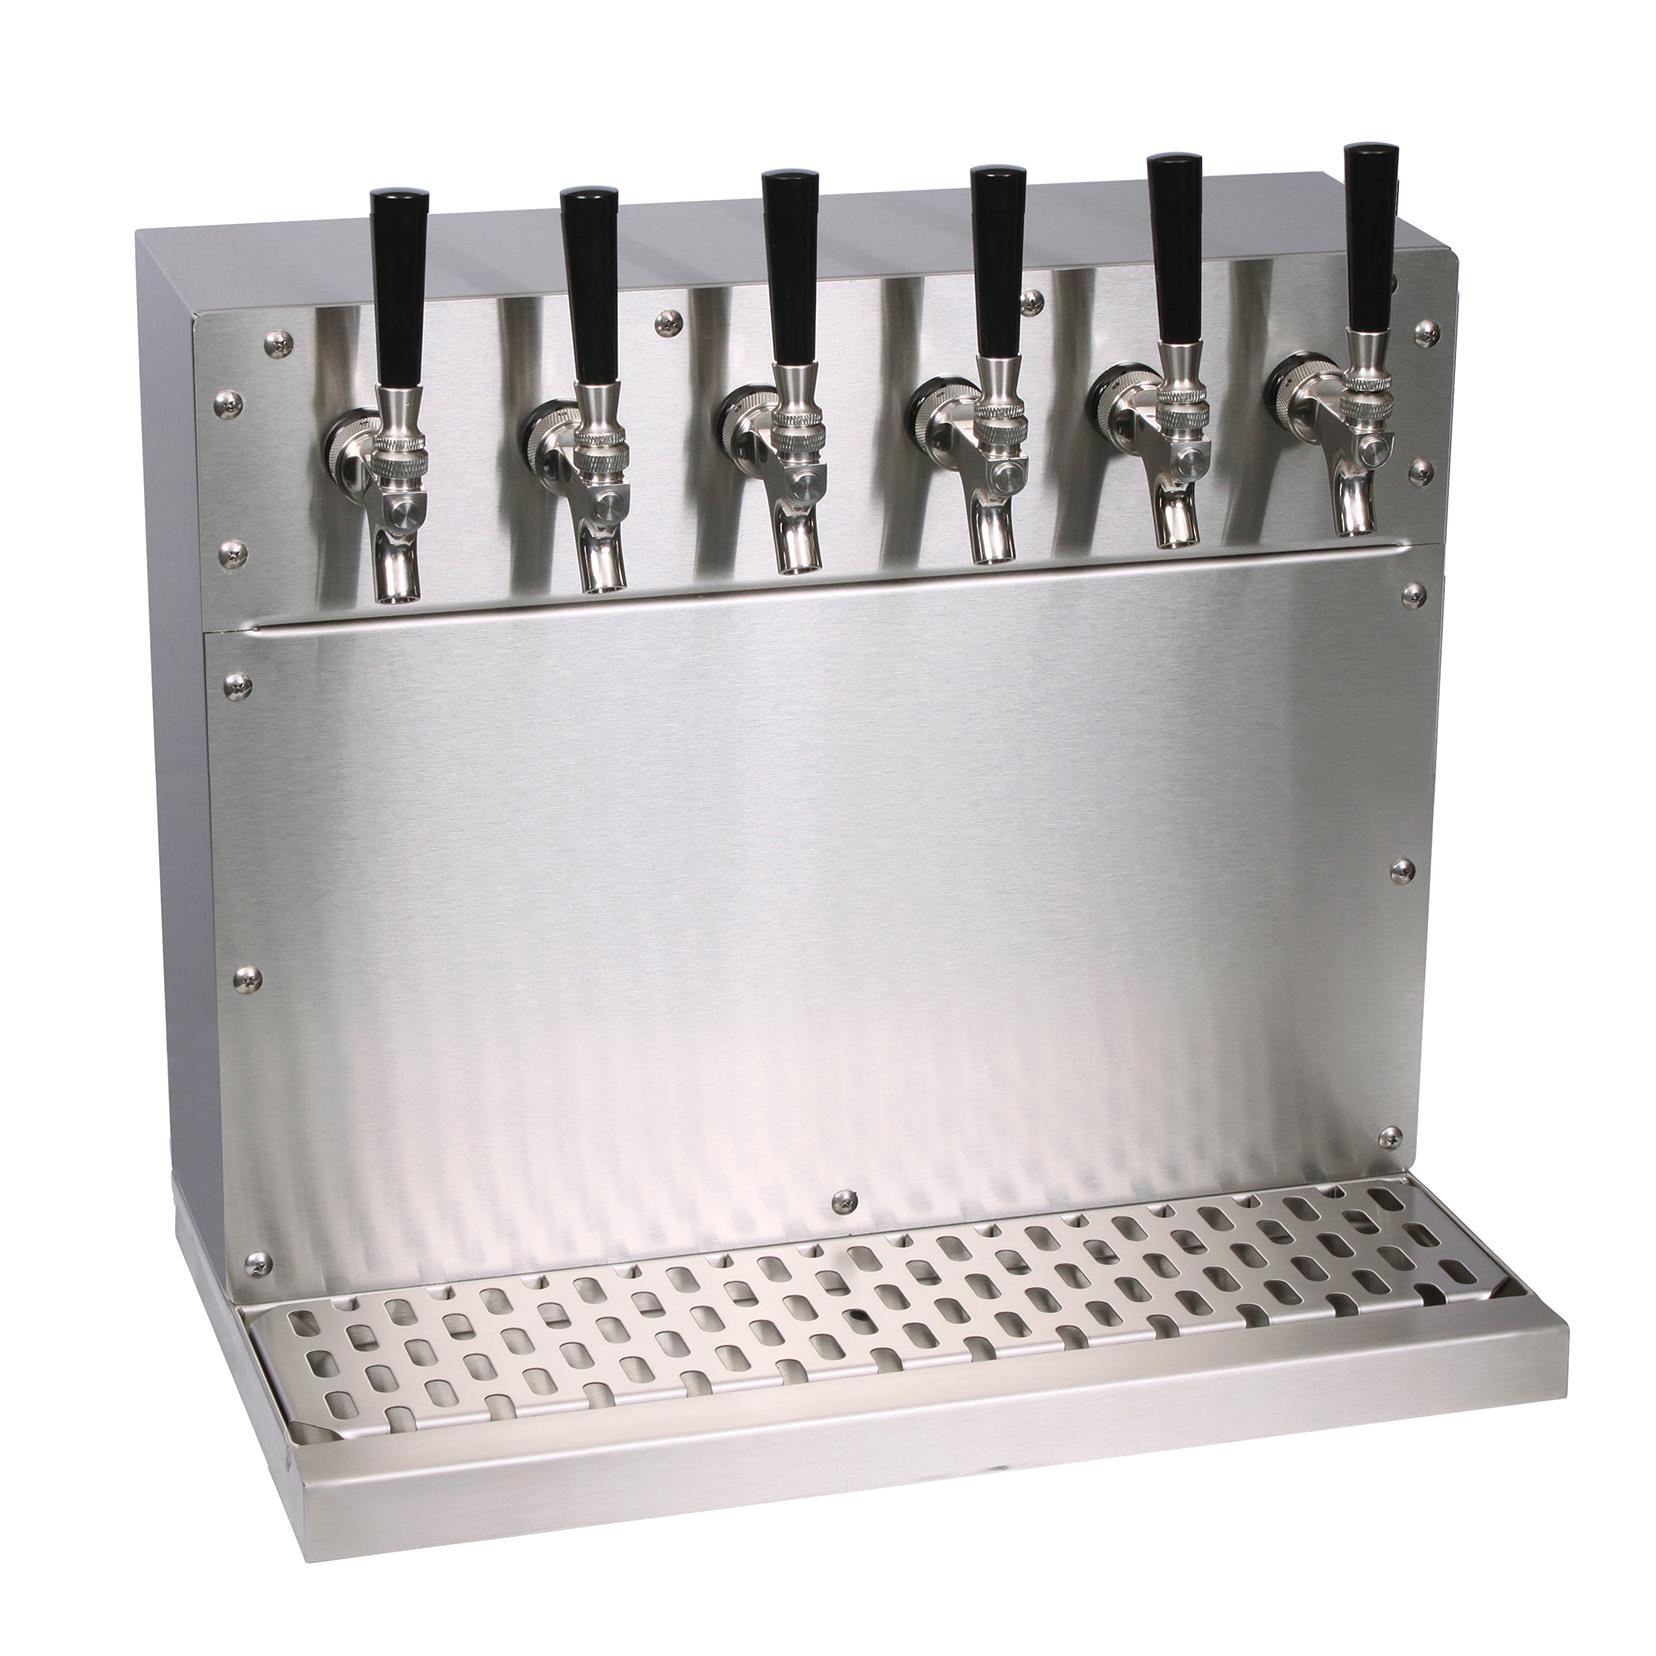 Glastender WT-6-SS draft beer / wine dispensing tower